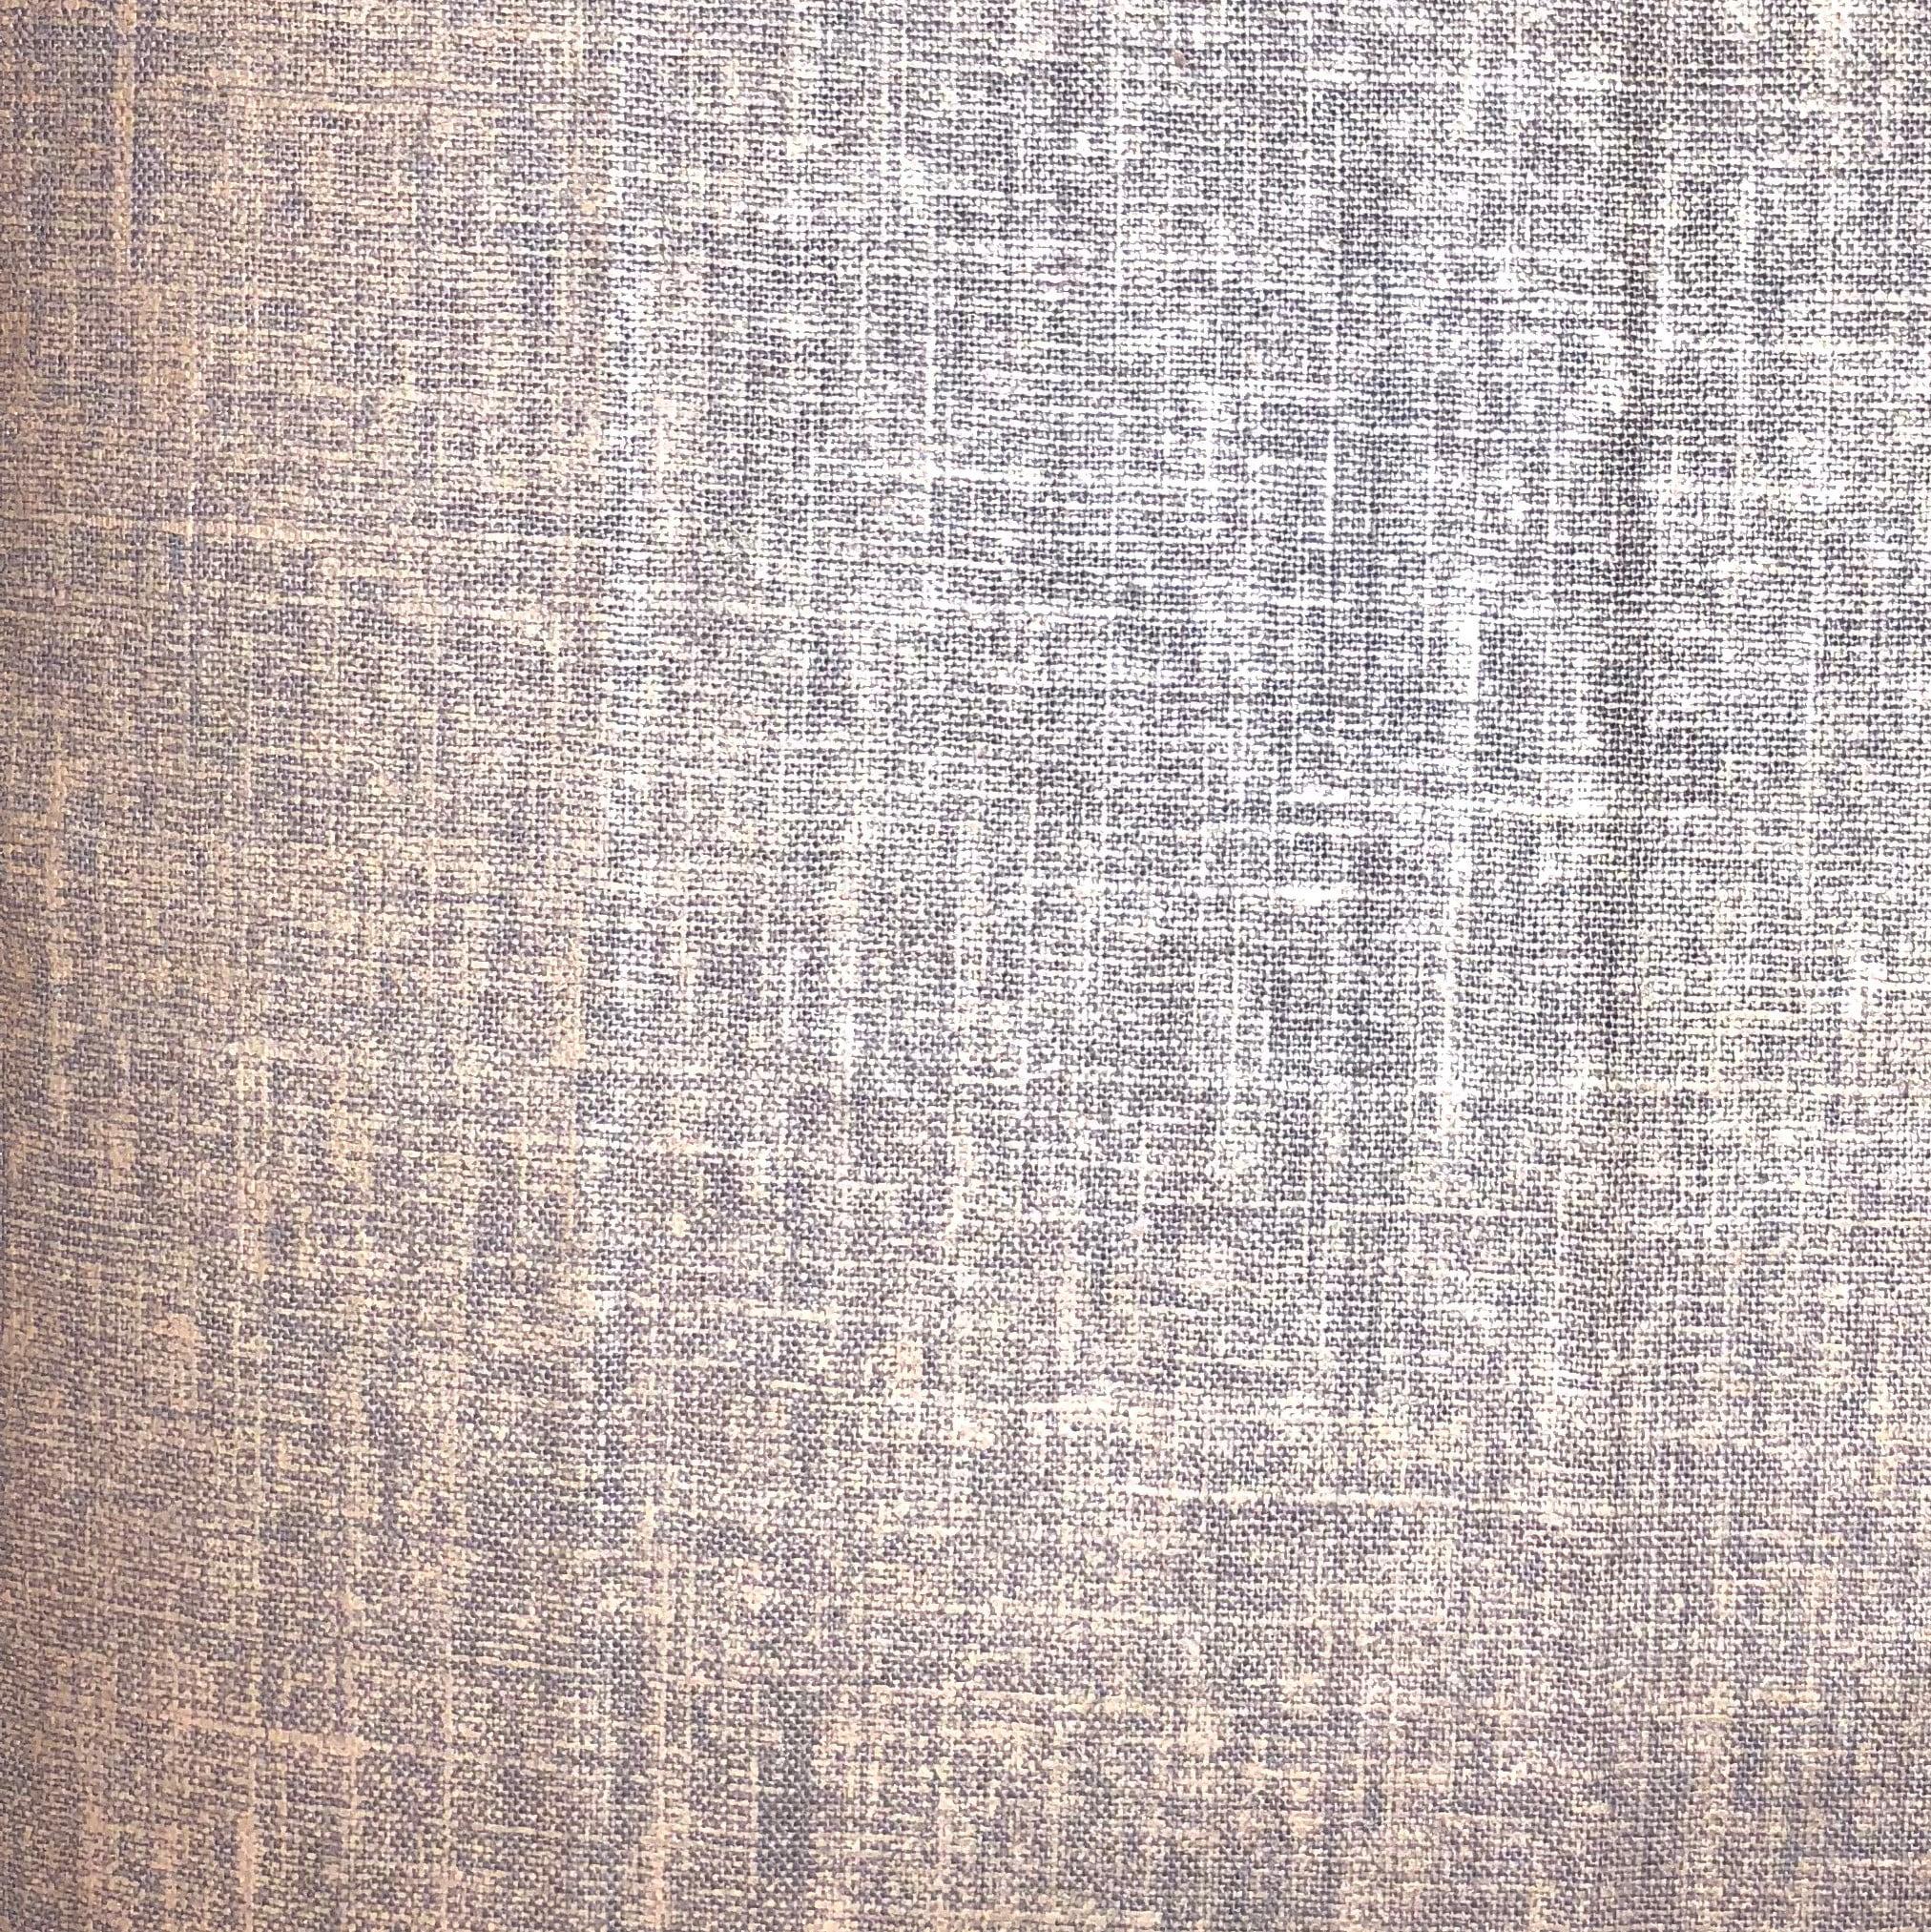 Plutus PBRA2264-2030-DP Radiance Blue Luxury Throw Pillow, 20 x 30 in. Queen - image 2 of 3